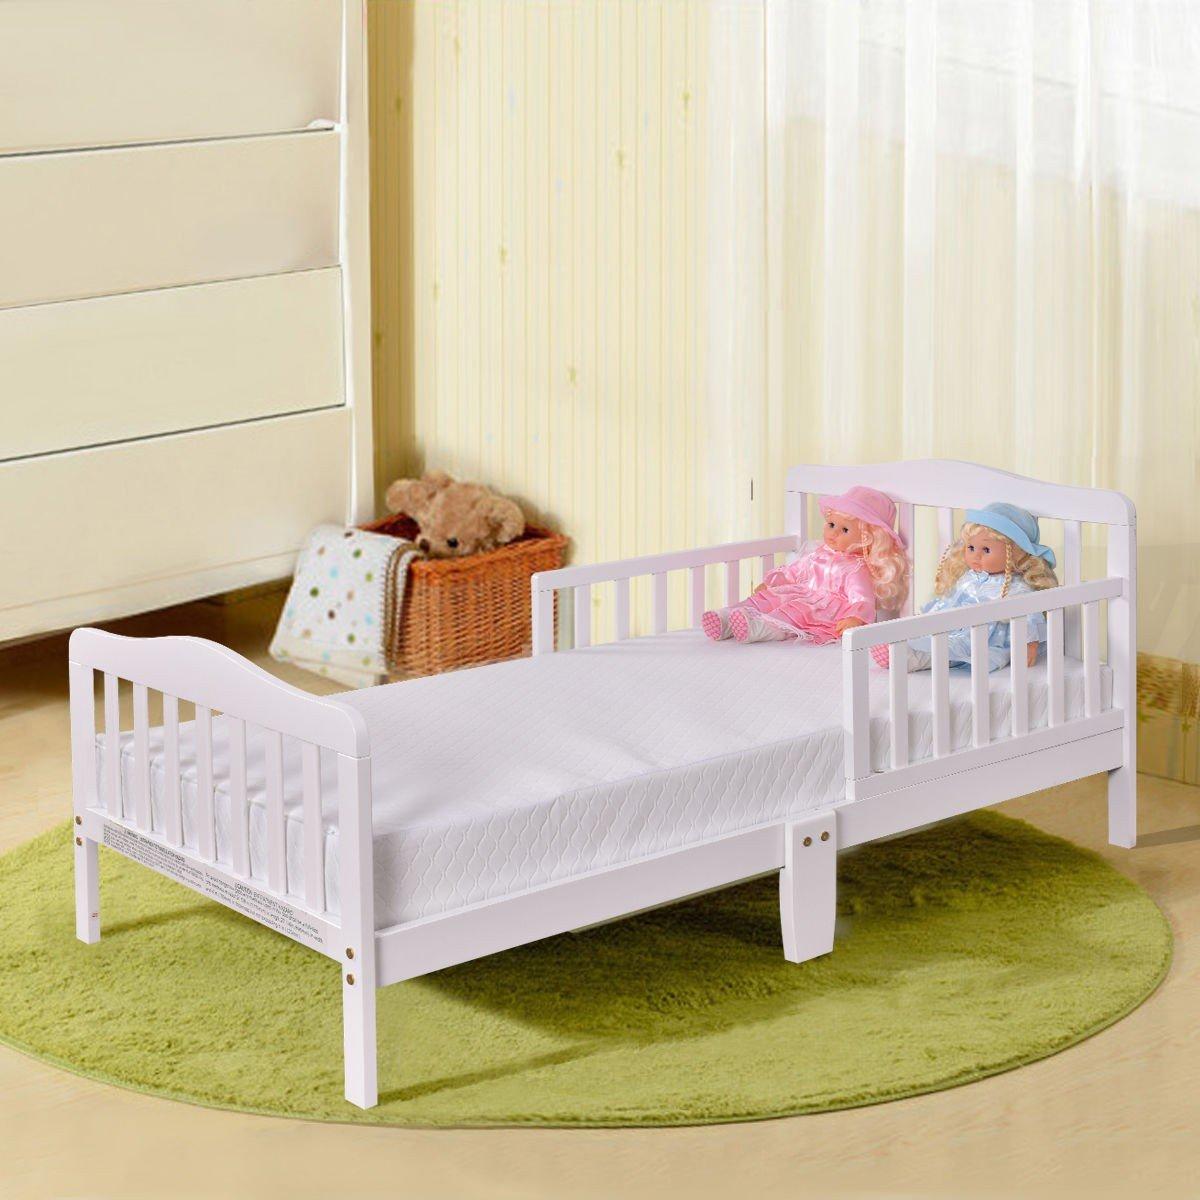 SKB family Pre Order Baby Toddler Bed Kids Wood Bedroom Furniture w/ Safety Rails, color White